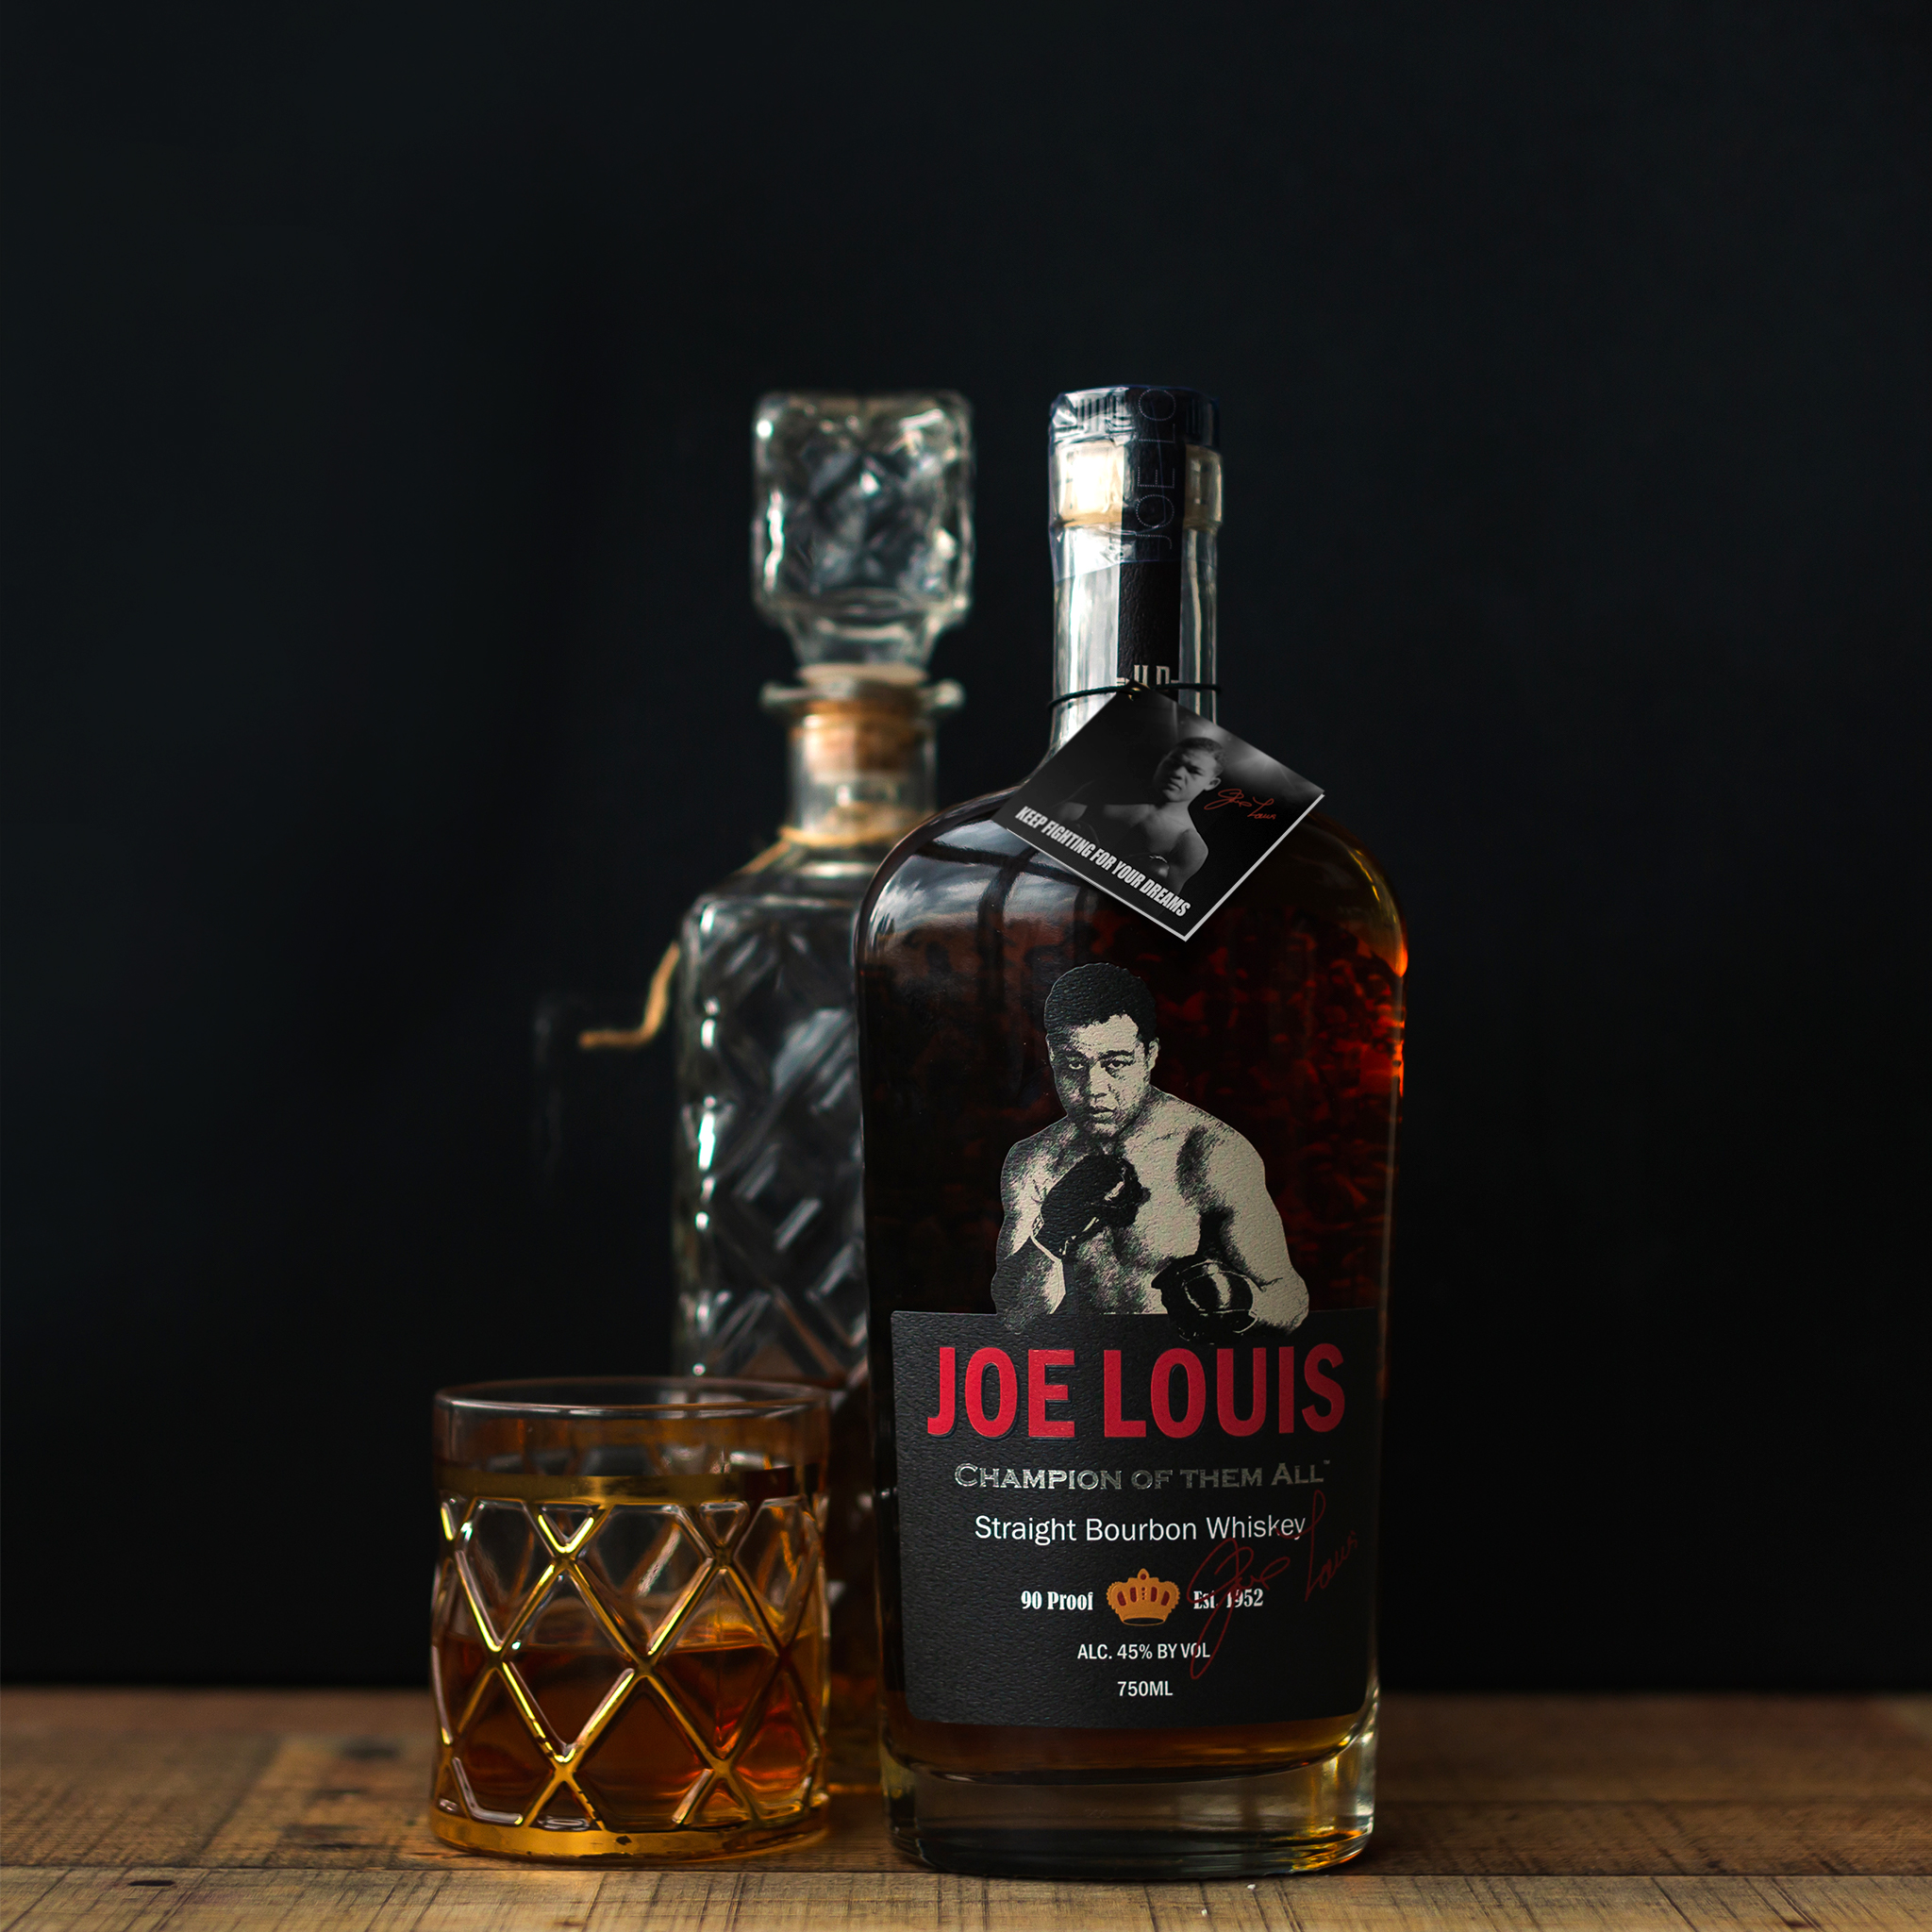 Joe Louis Bourbon Champion of them all - bottle, black background